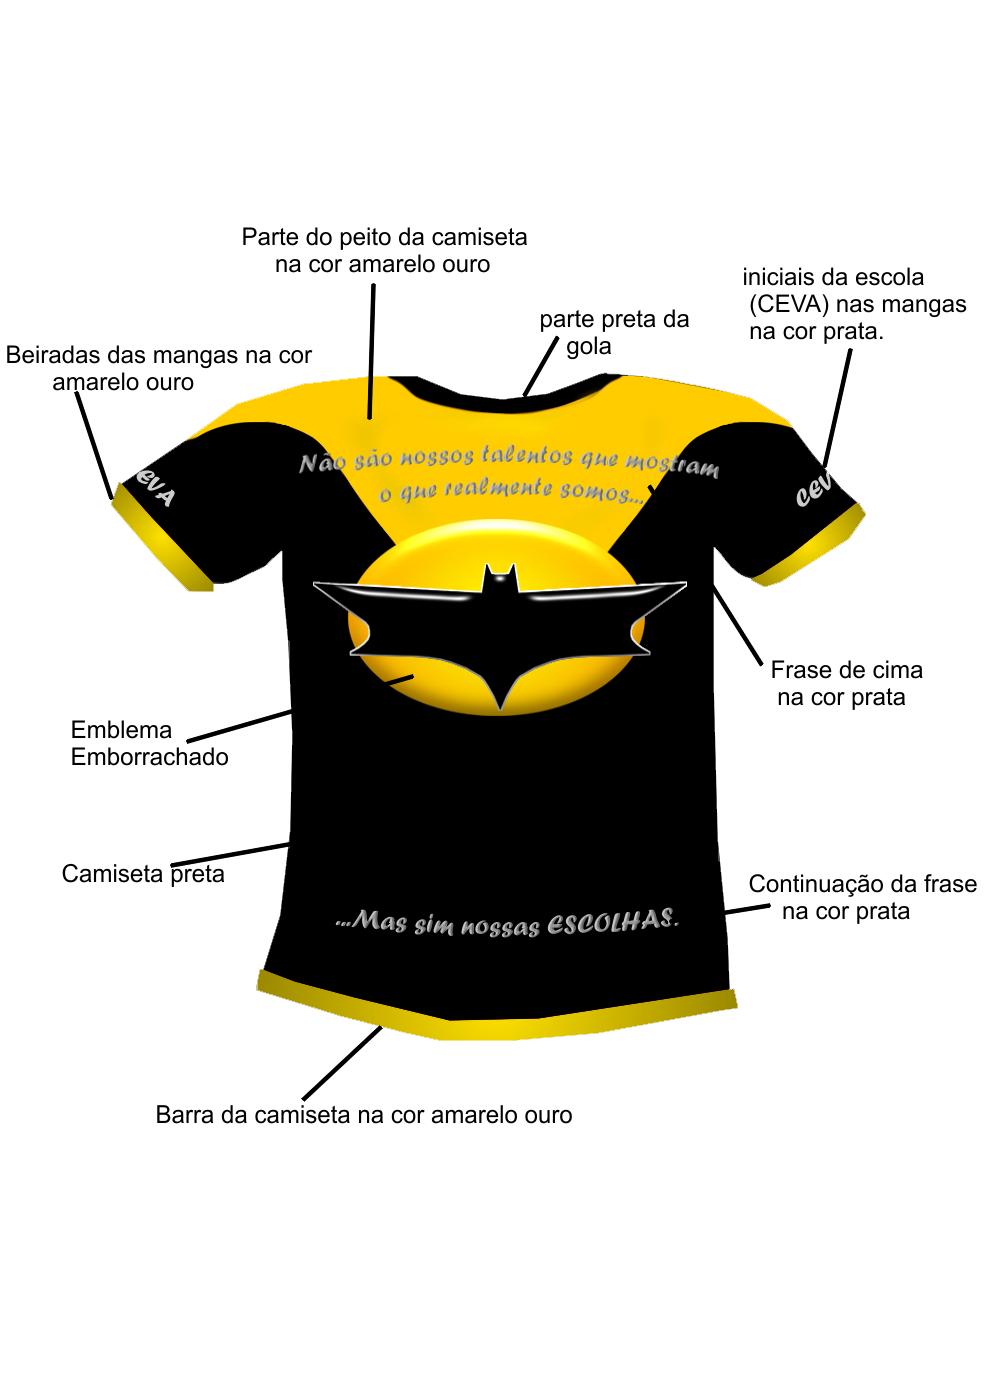 Camiseta Formandos 2011